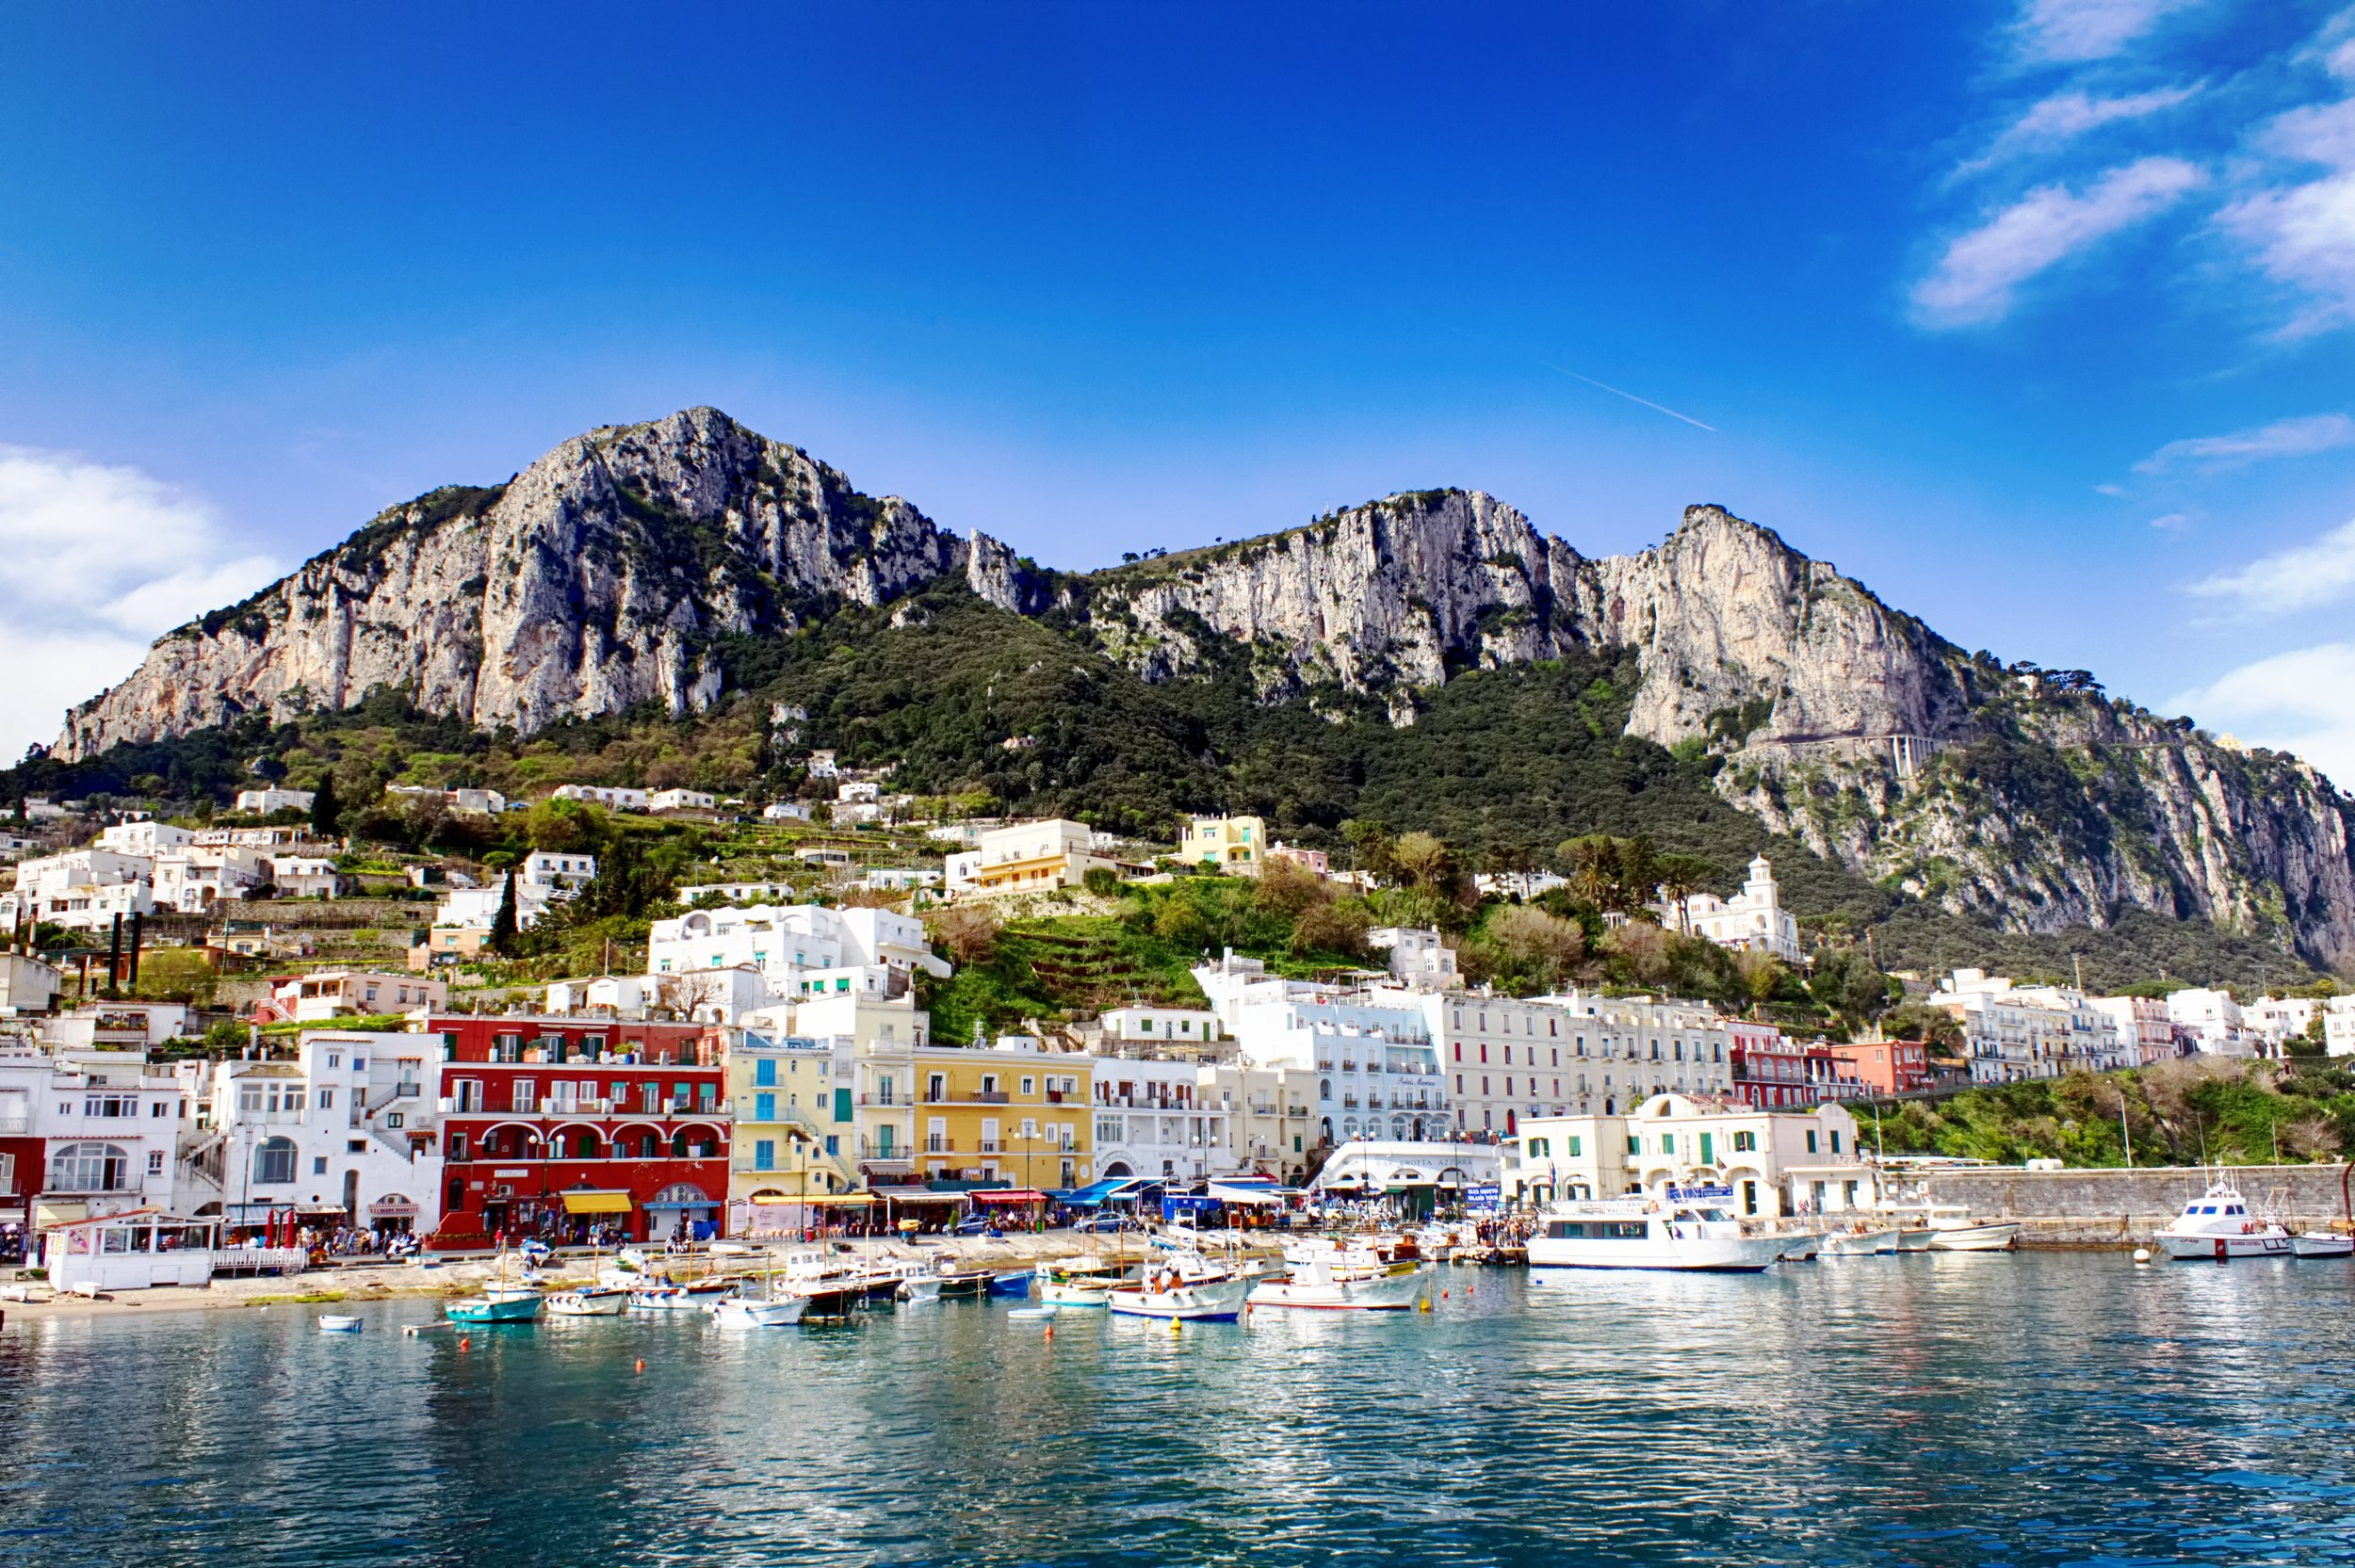 the island of capri voyedge rx travel fitness